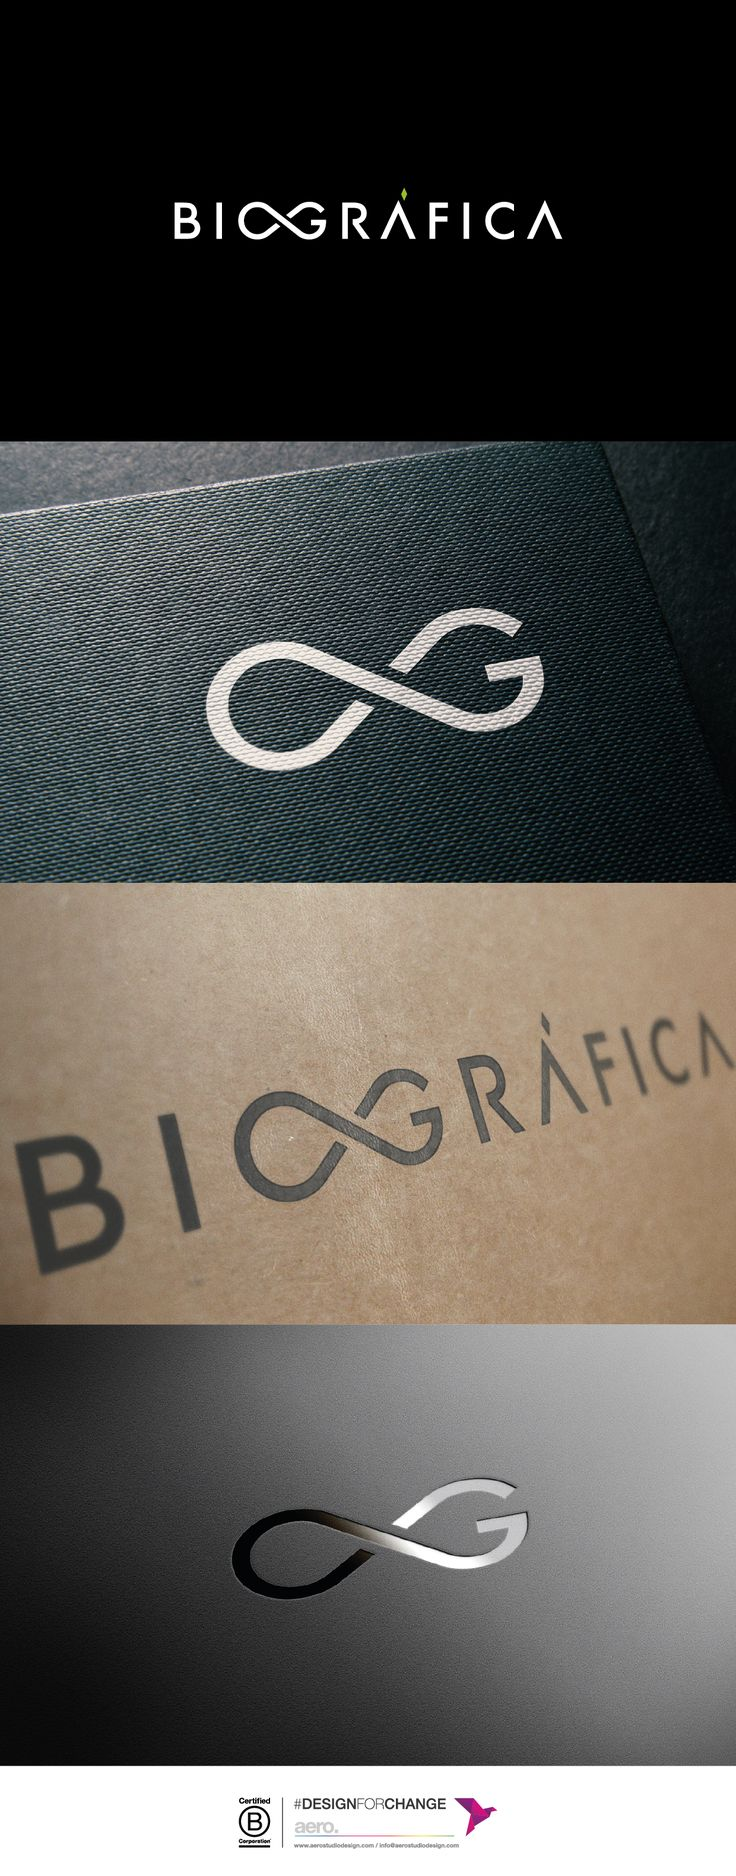 Biográfica branding design.